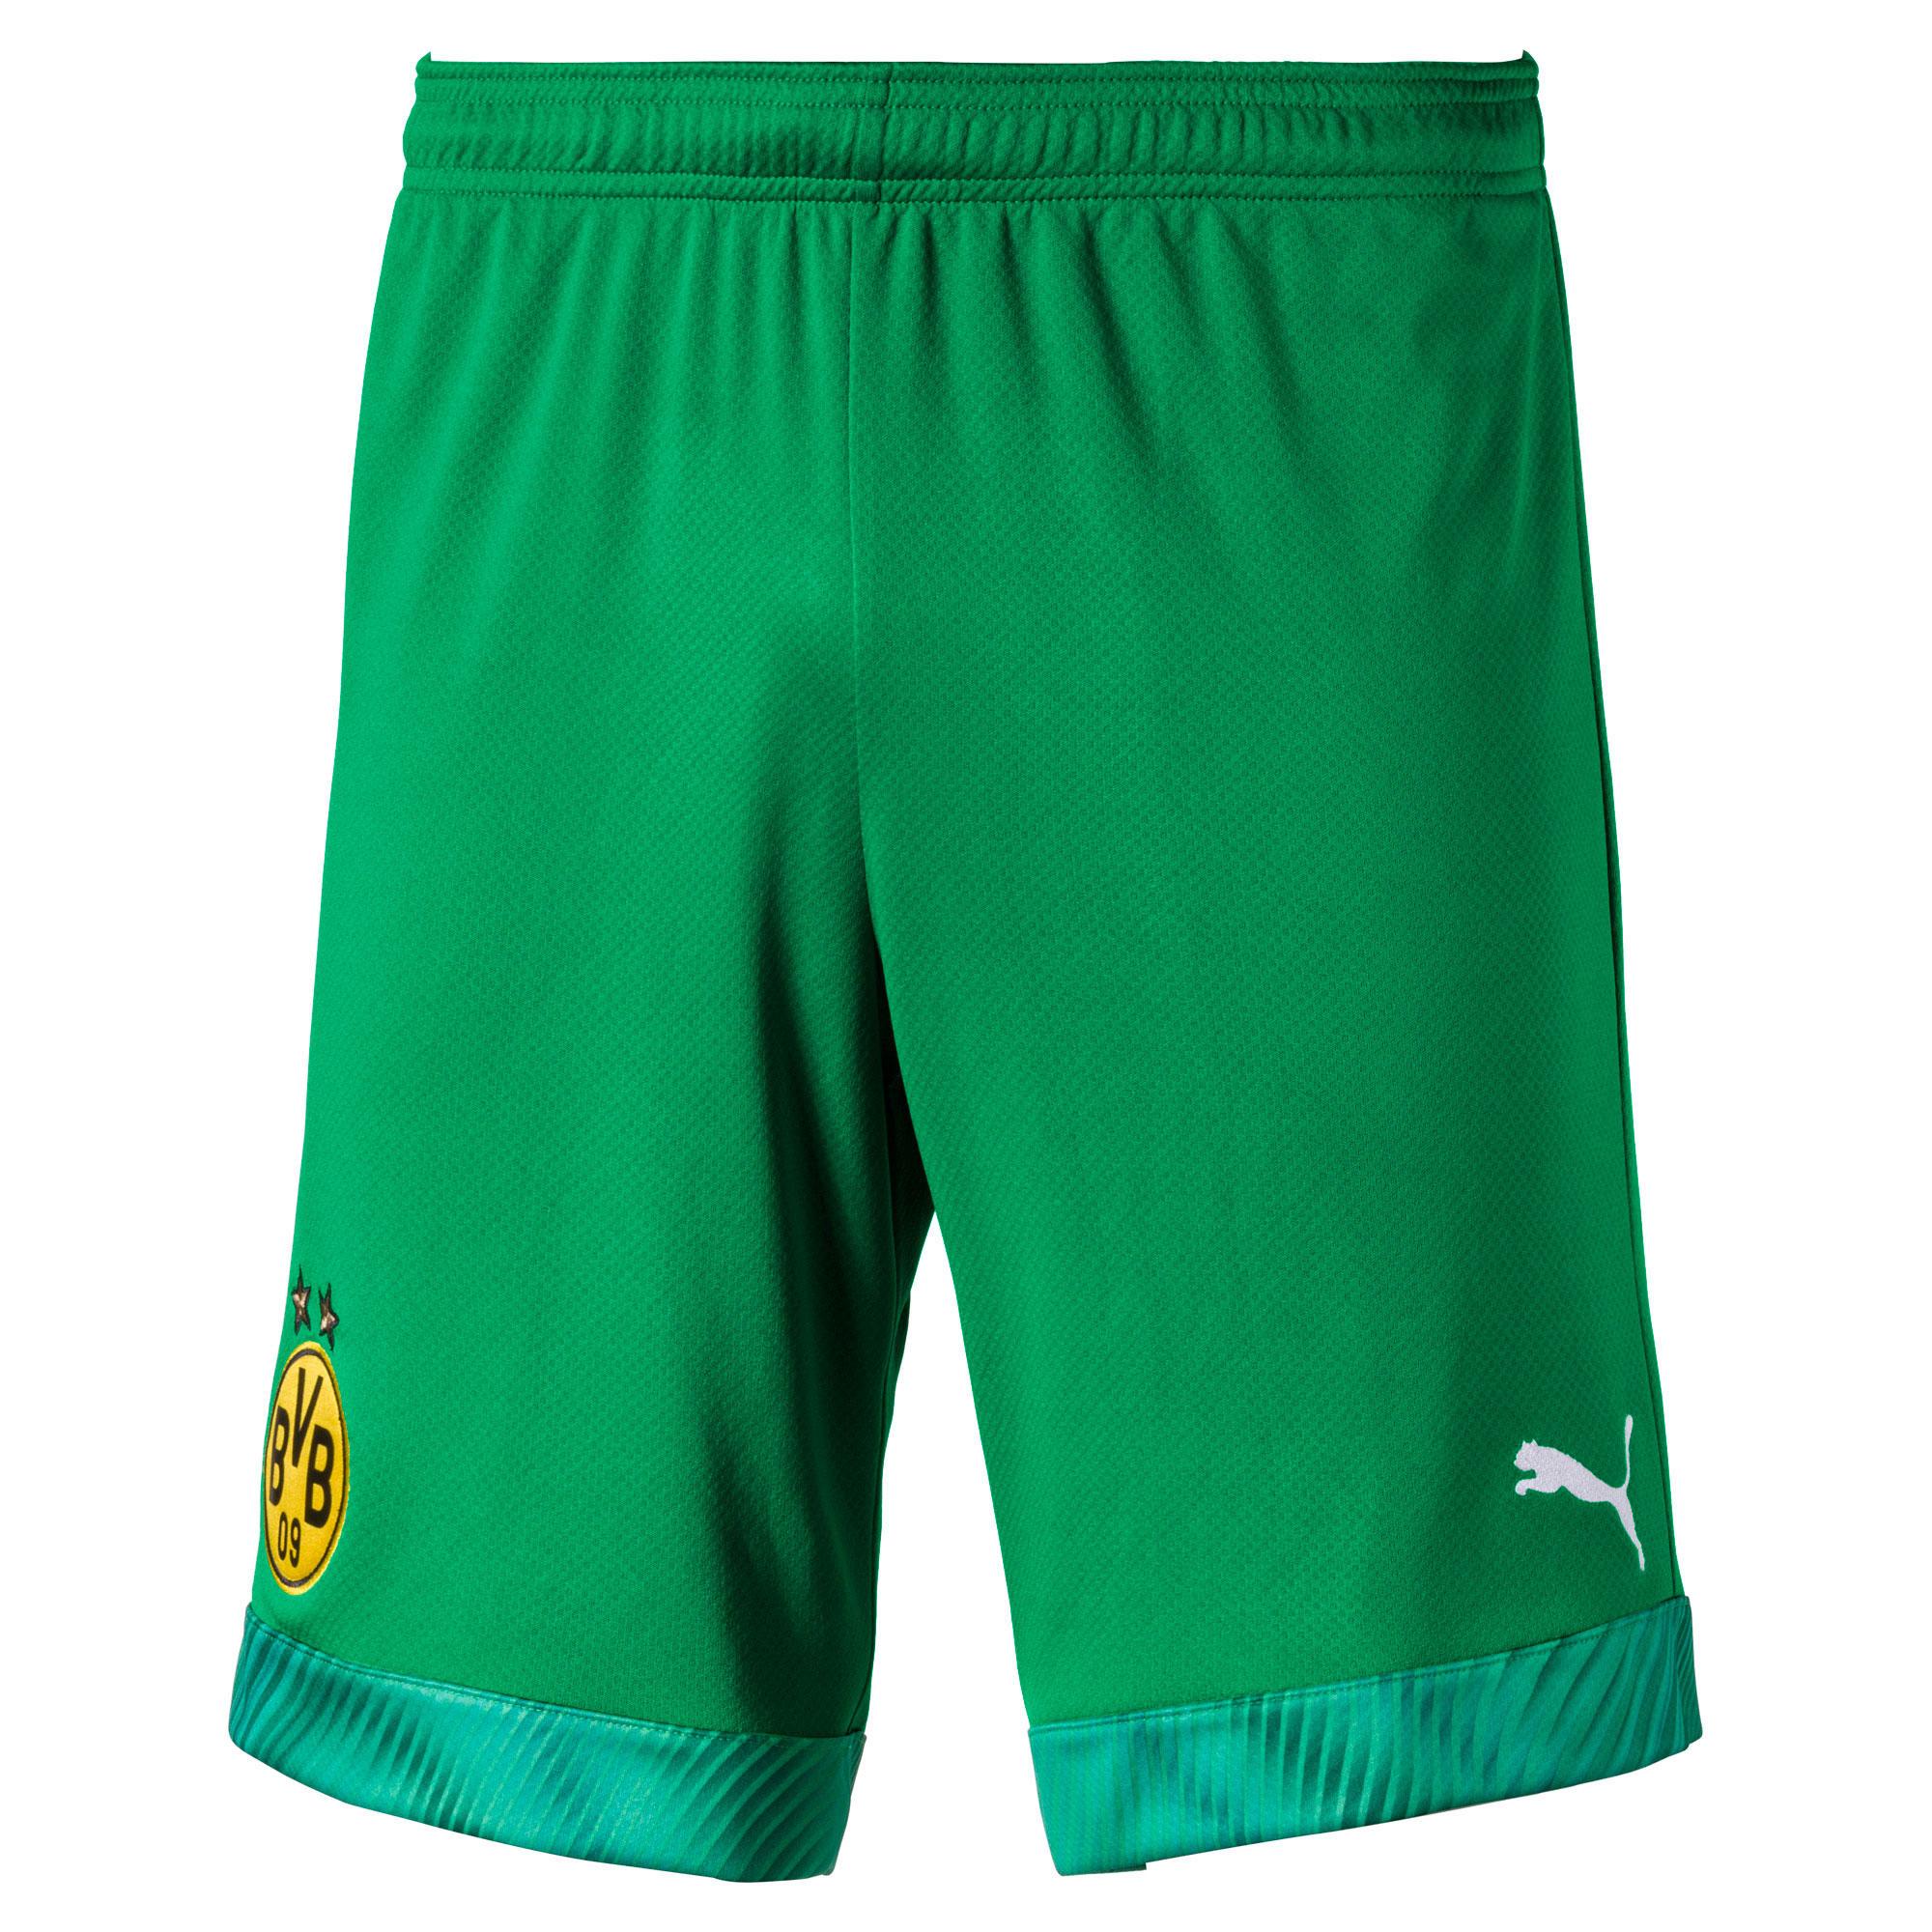 BVB Home Goalkeeper Shorts 2019-20